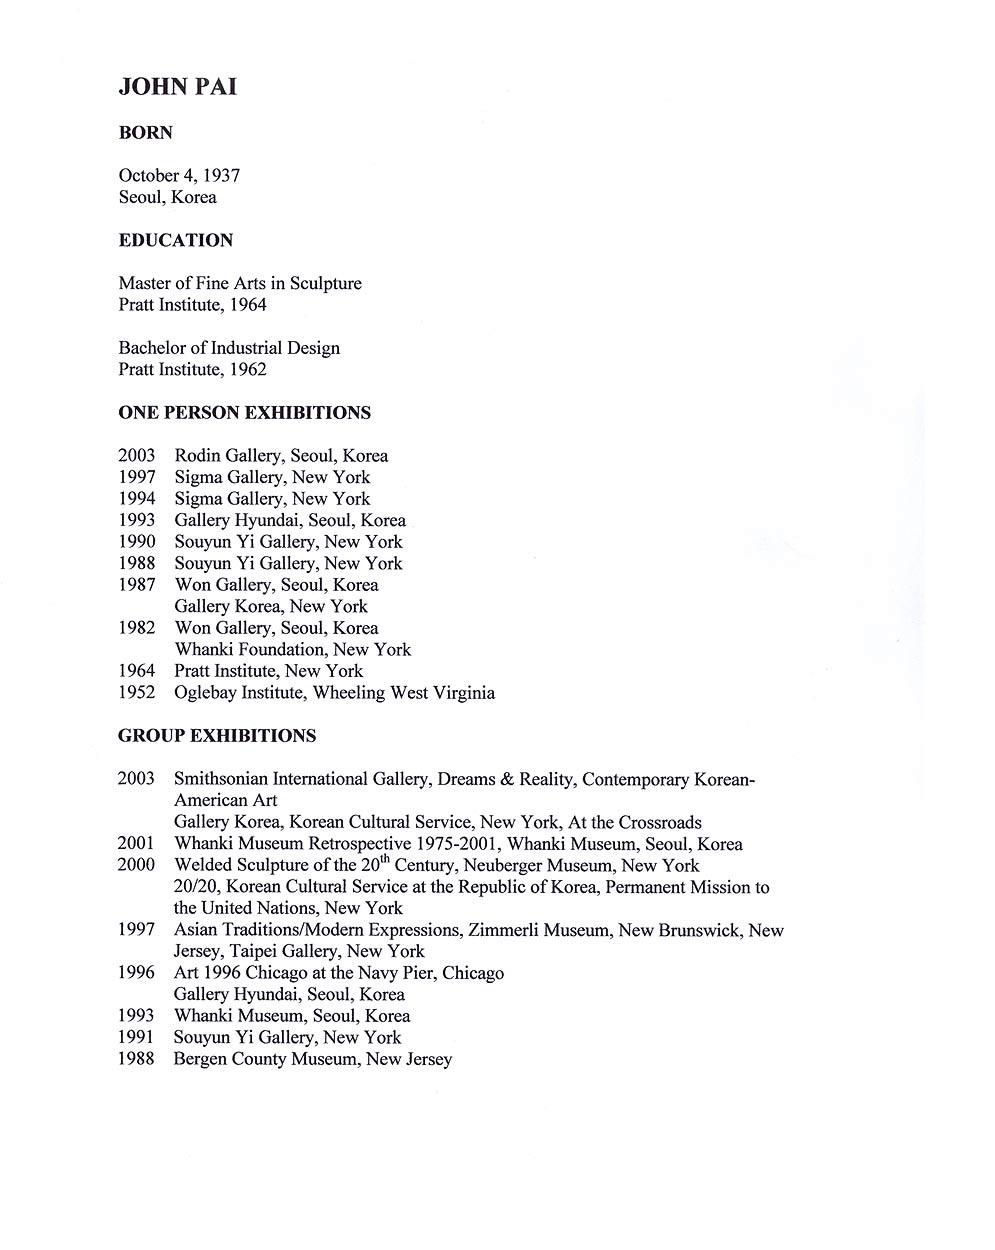 John Pai's Resume, pg 1